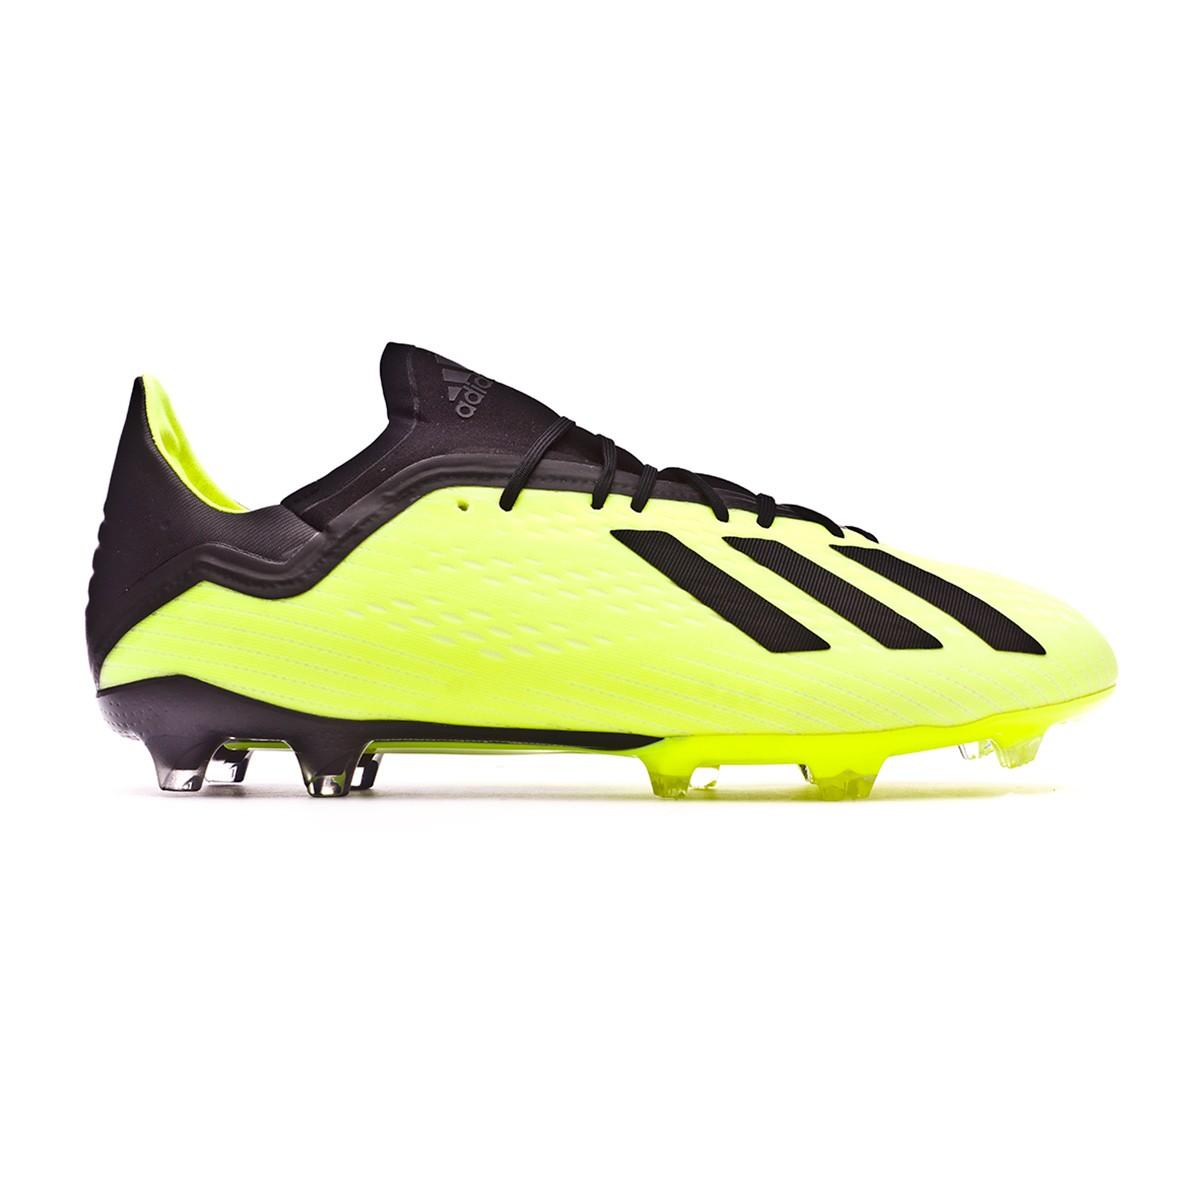 dcd1430ccd37 Football Boots adidas X 18.2 FG Solar yellow-Core black-White ...